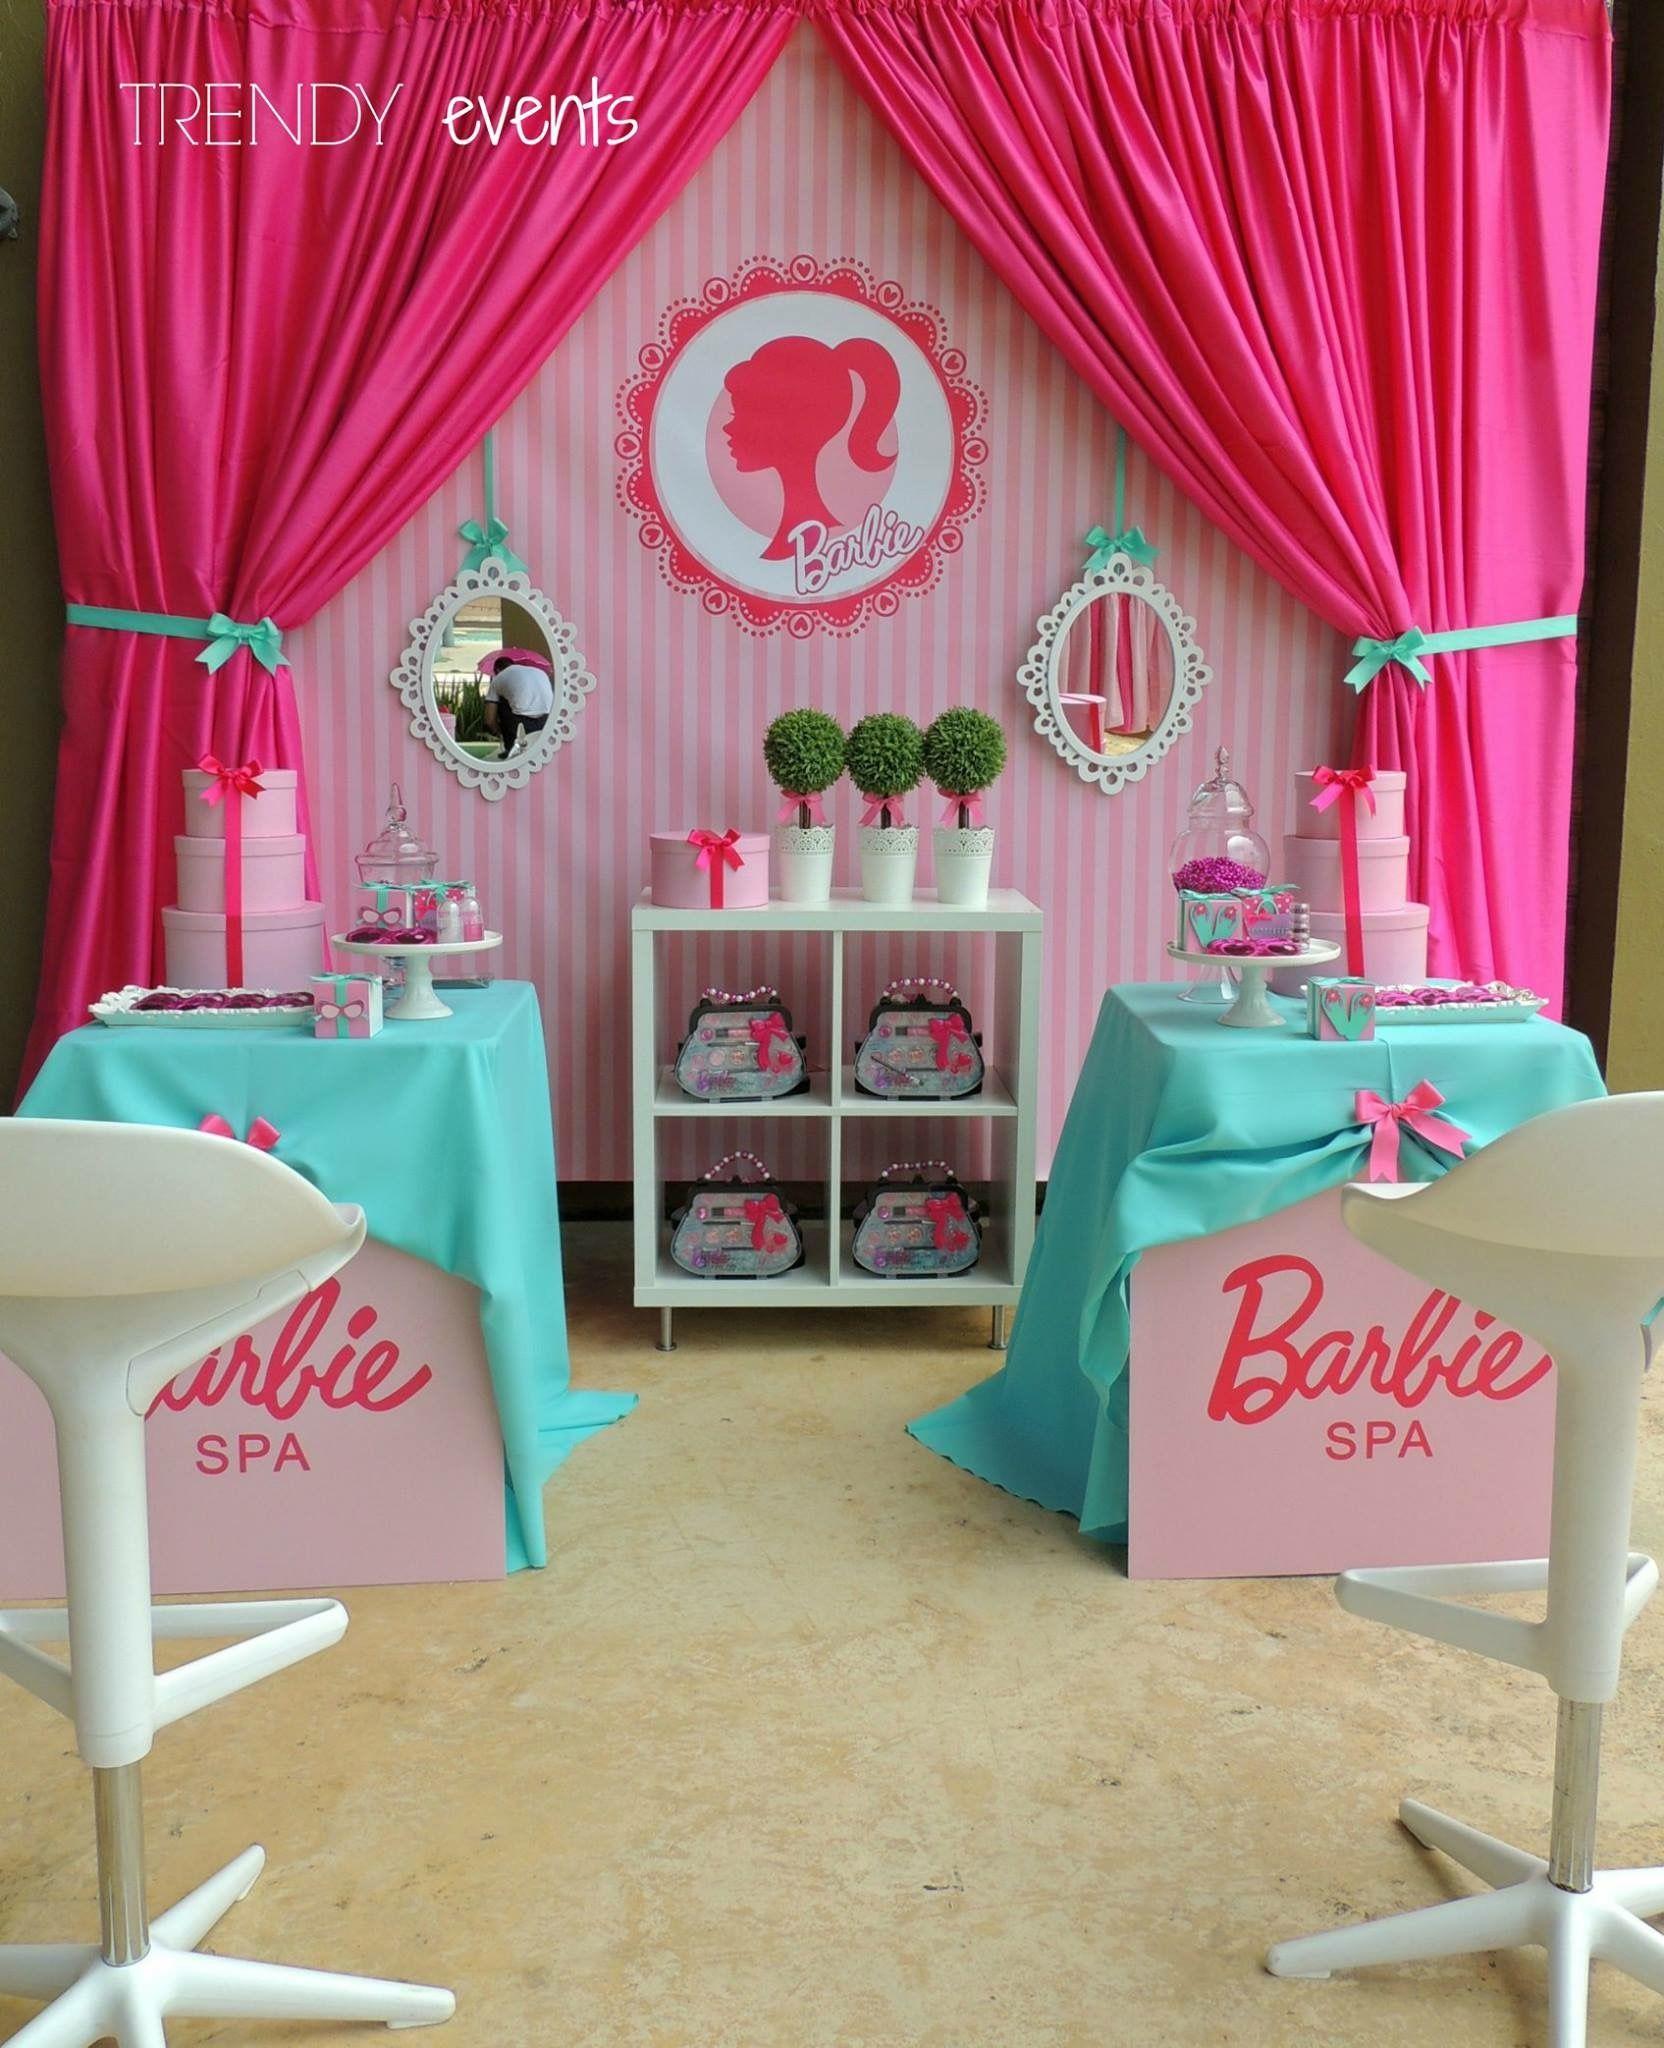 Duel Birthday Decor Zebra Barbie And Princess Themes: Simple Barbie Theme Party Barbie Birthday Party Girls